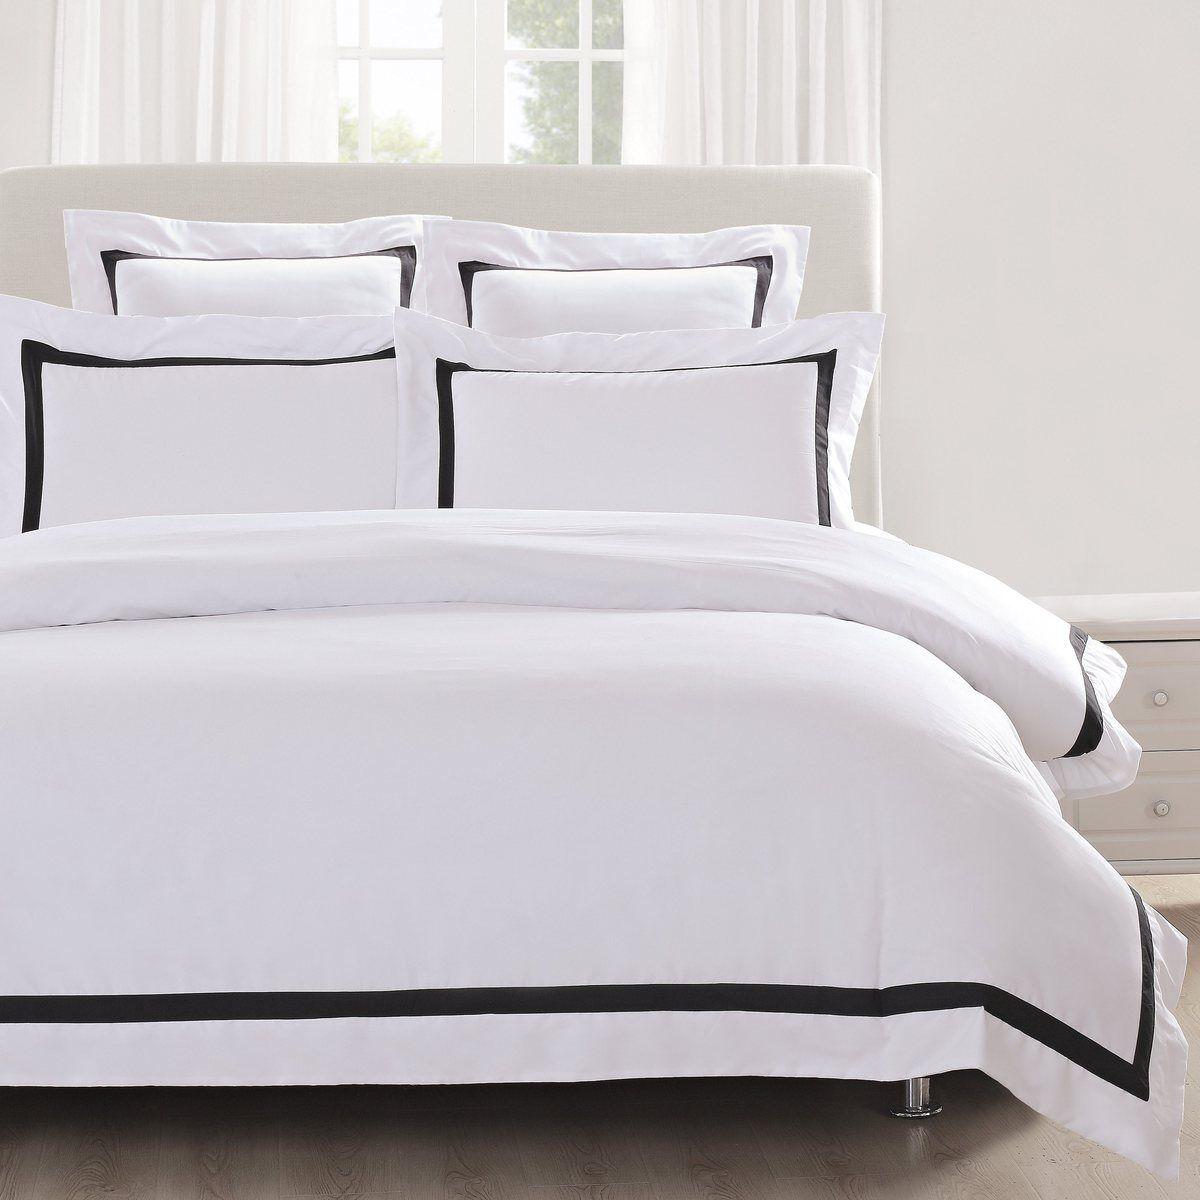 Ava Quilt Cover Set Black Trim White Quilt Cover Quilt Cover Sets White Linen Bedding